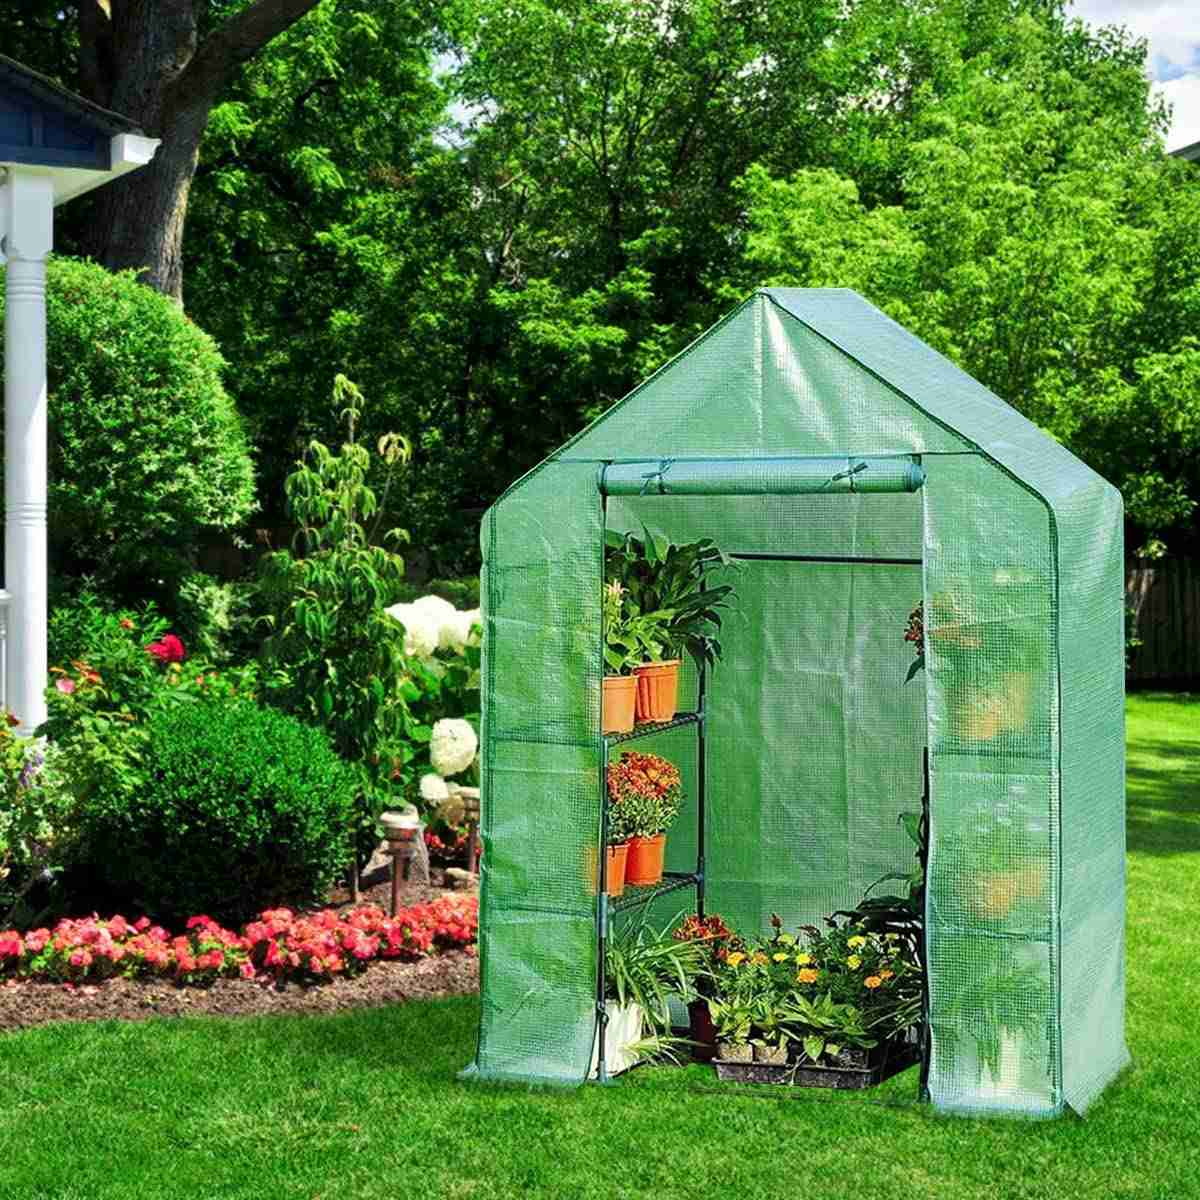 g portable 8 shelves greenhouse image